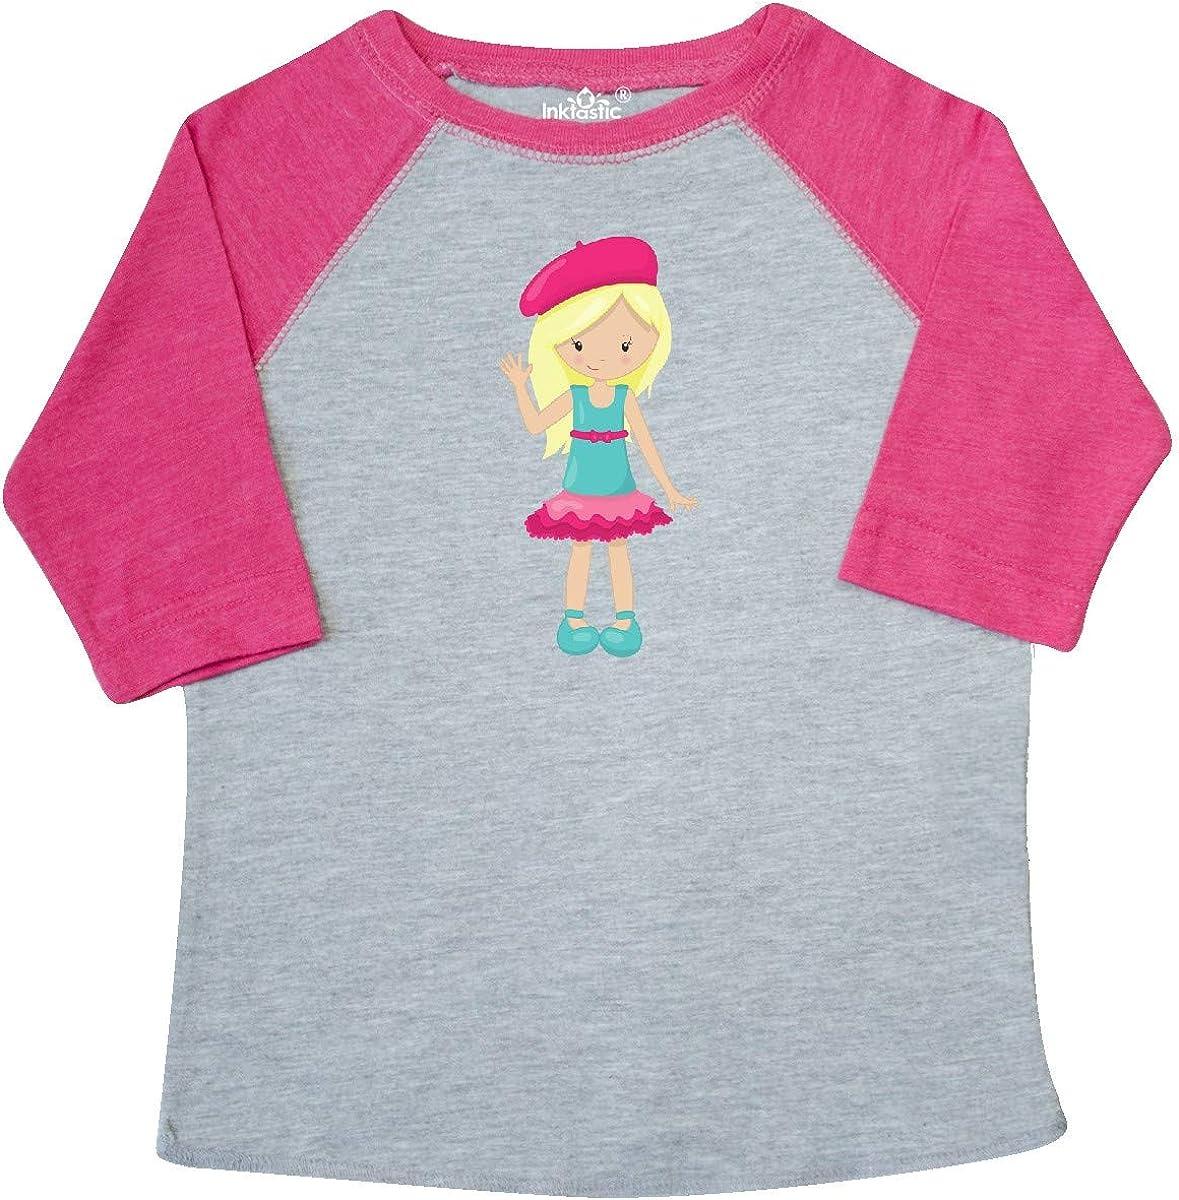 inktastic French Girl Fashion Girl Blonde Hair Beret Toddler T-Shirt